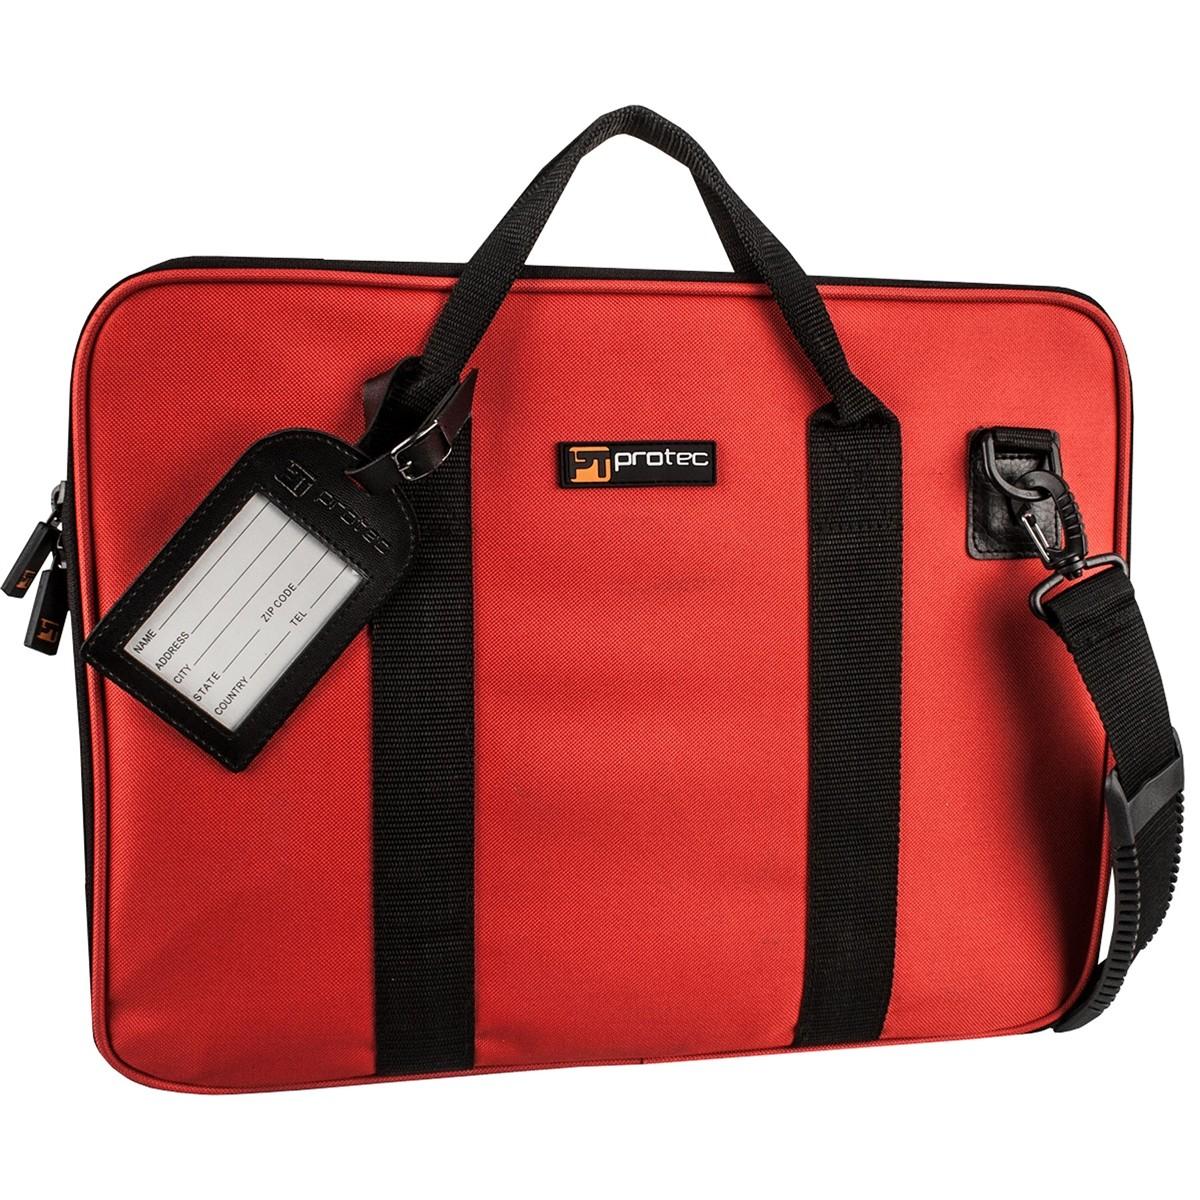 Protec Slim Portfolio Bag (Red P5RX)